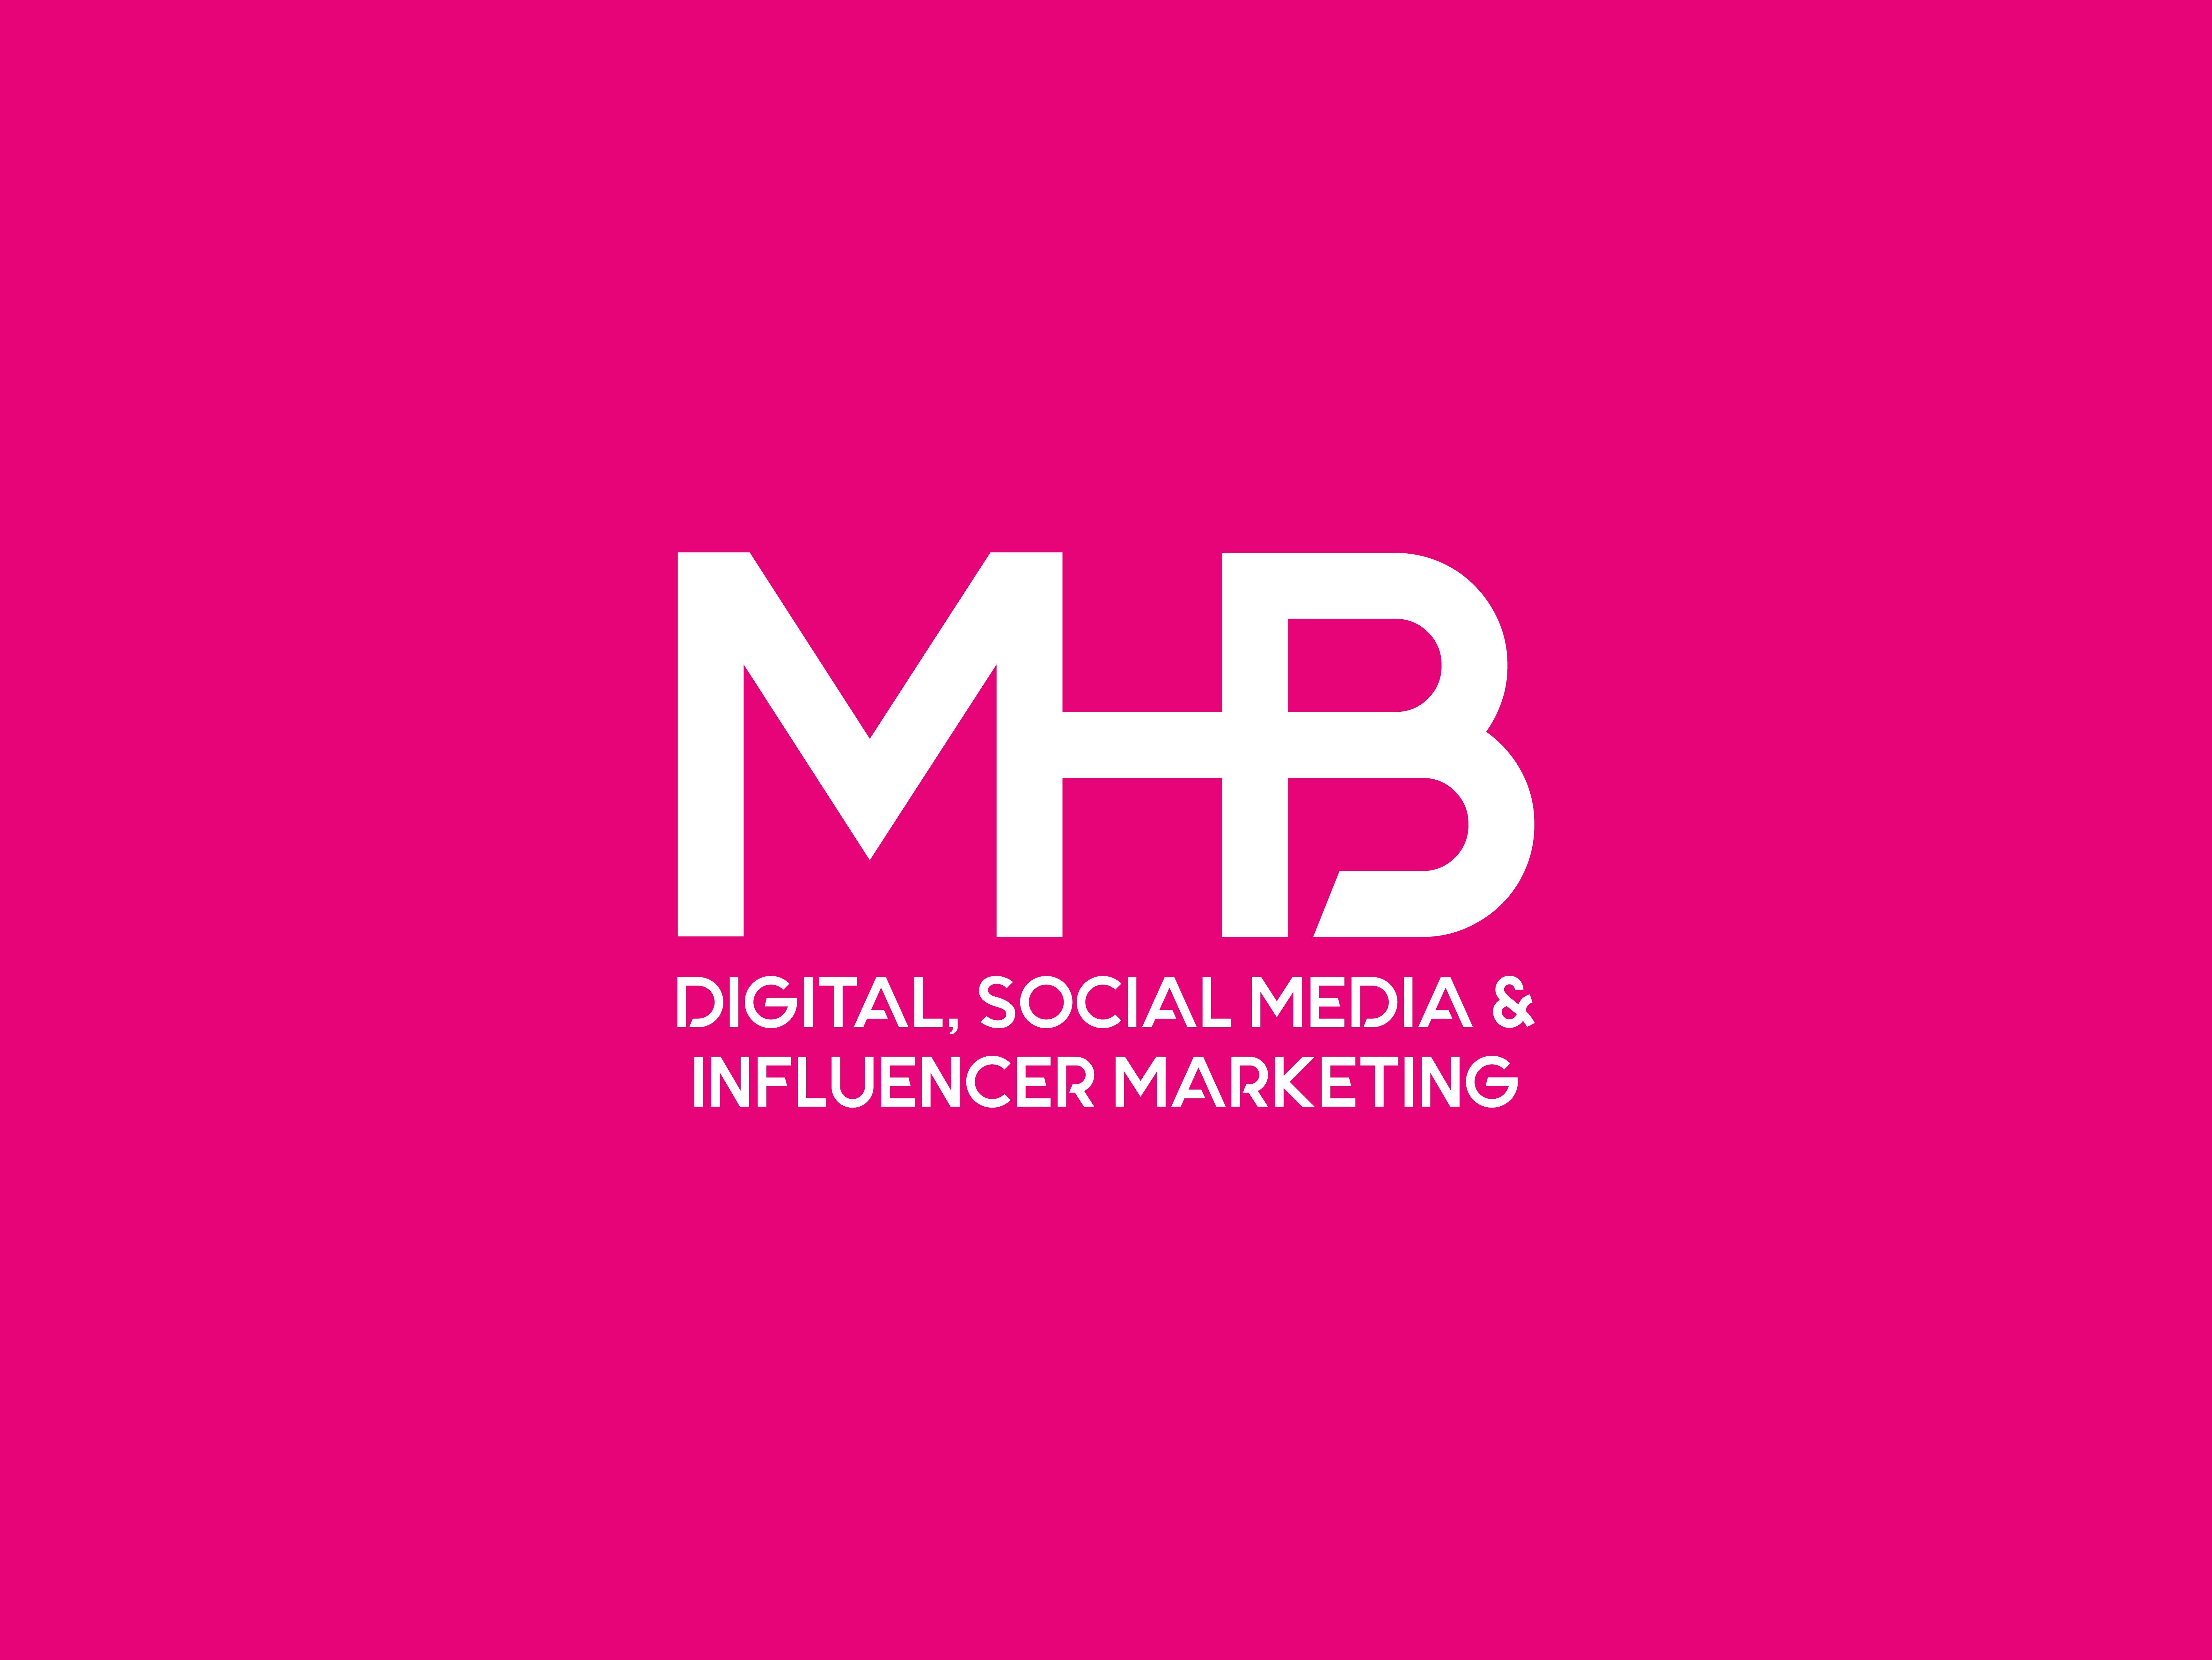 MHB Digital